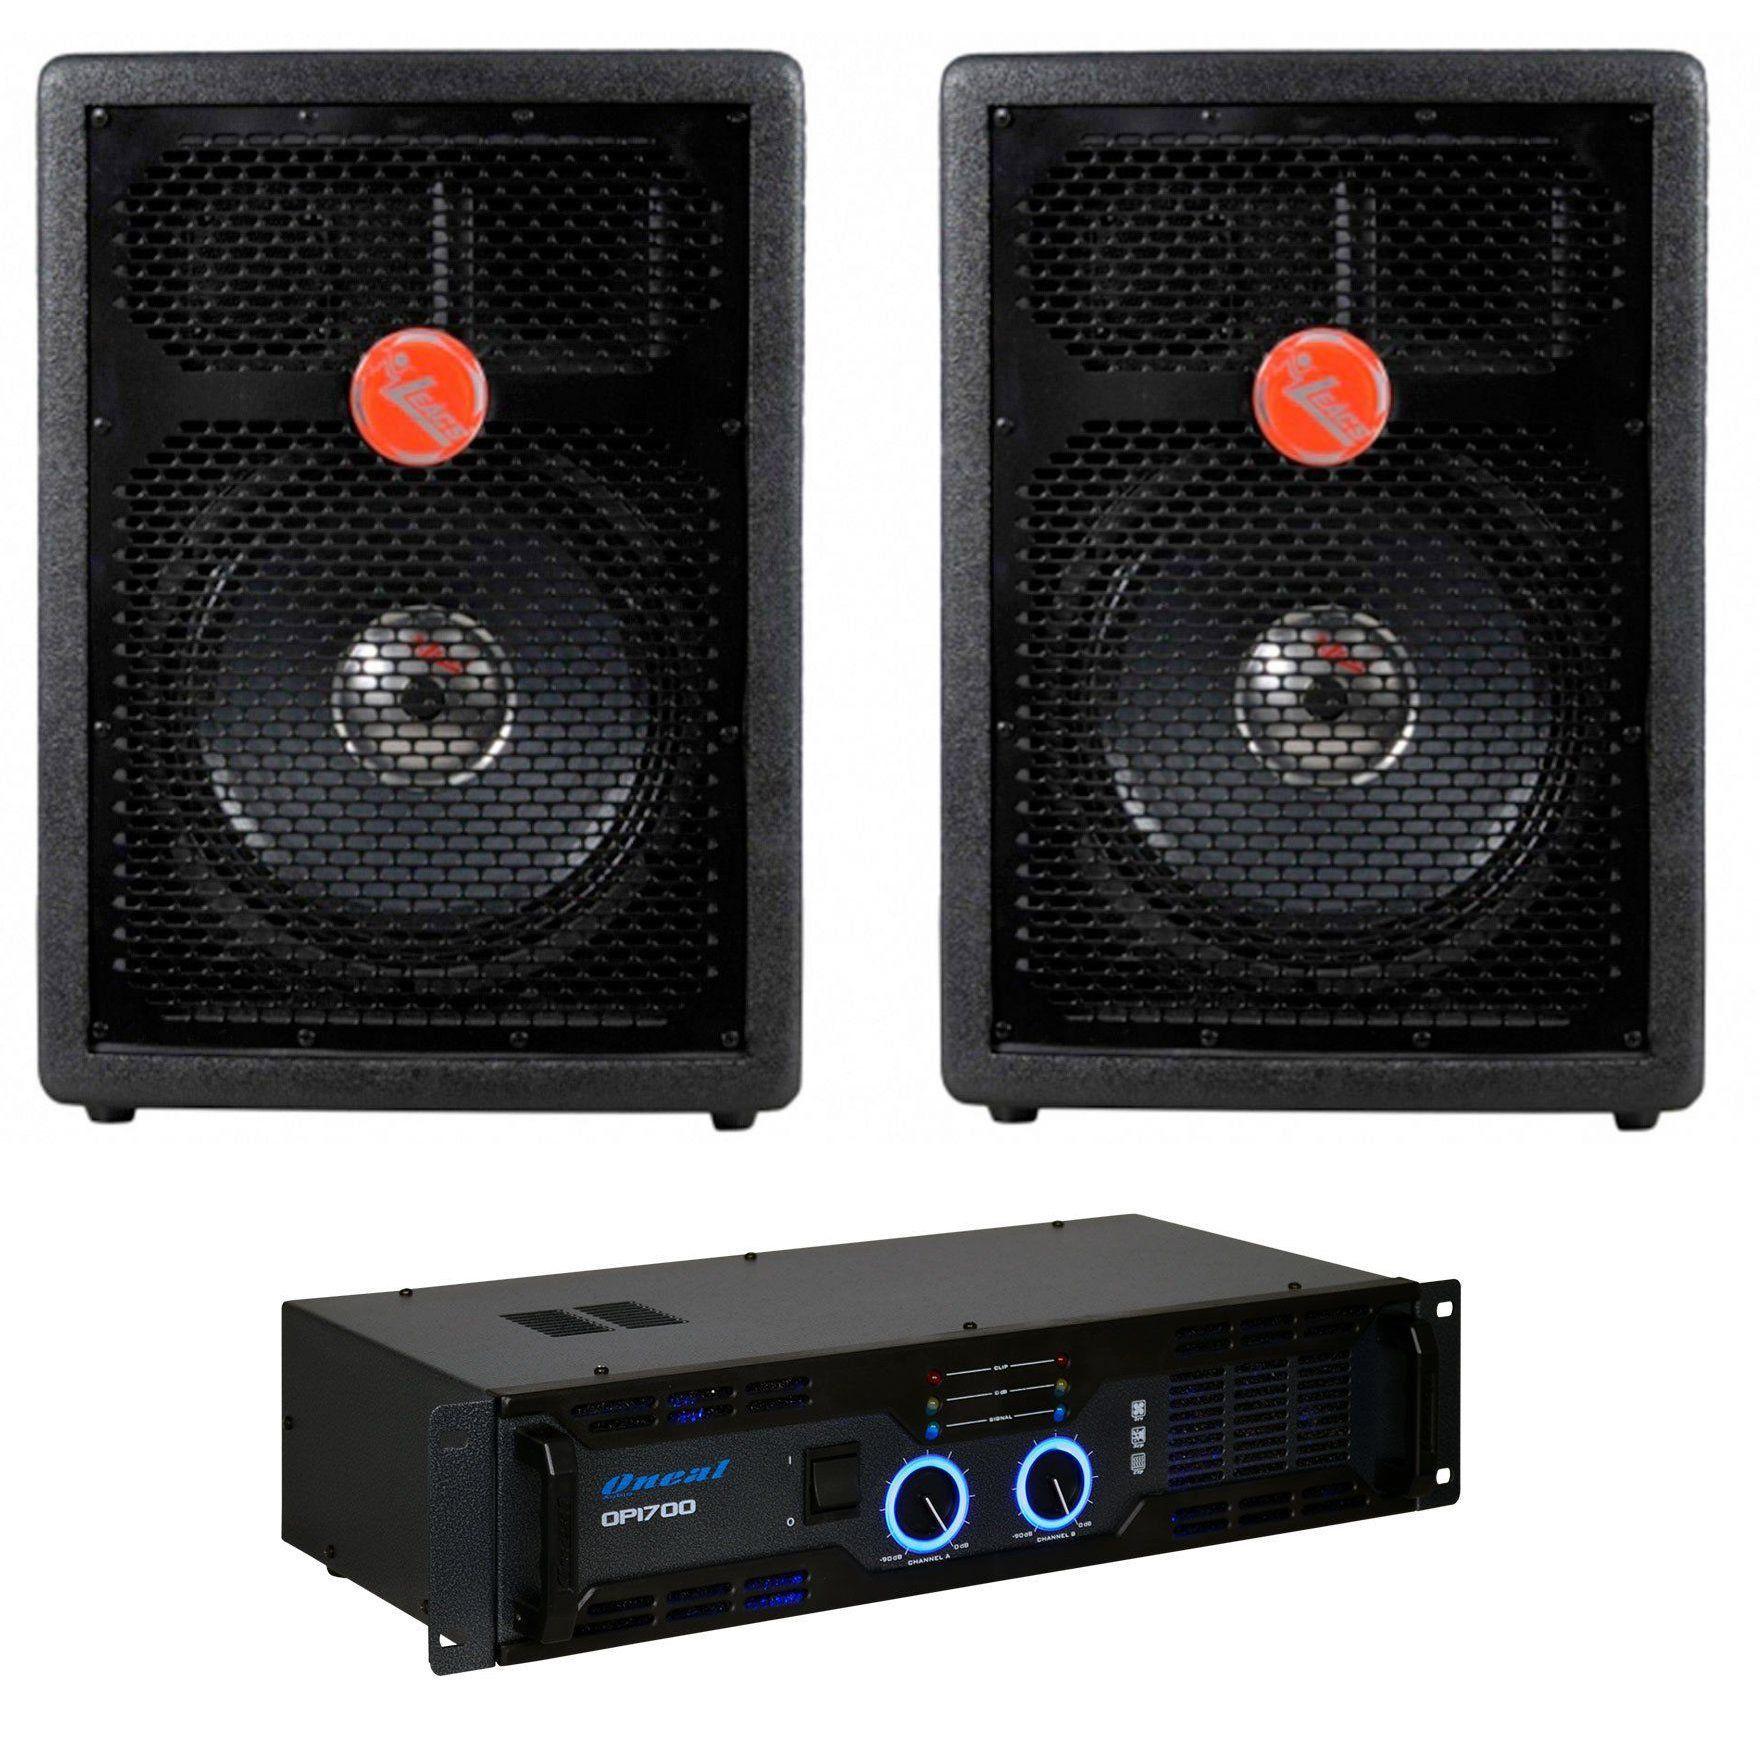 Kit 2 Caixa Acústica Leacs Fit320 + Amplificador Oneal Op1700